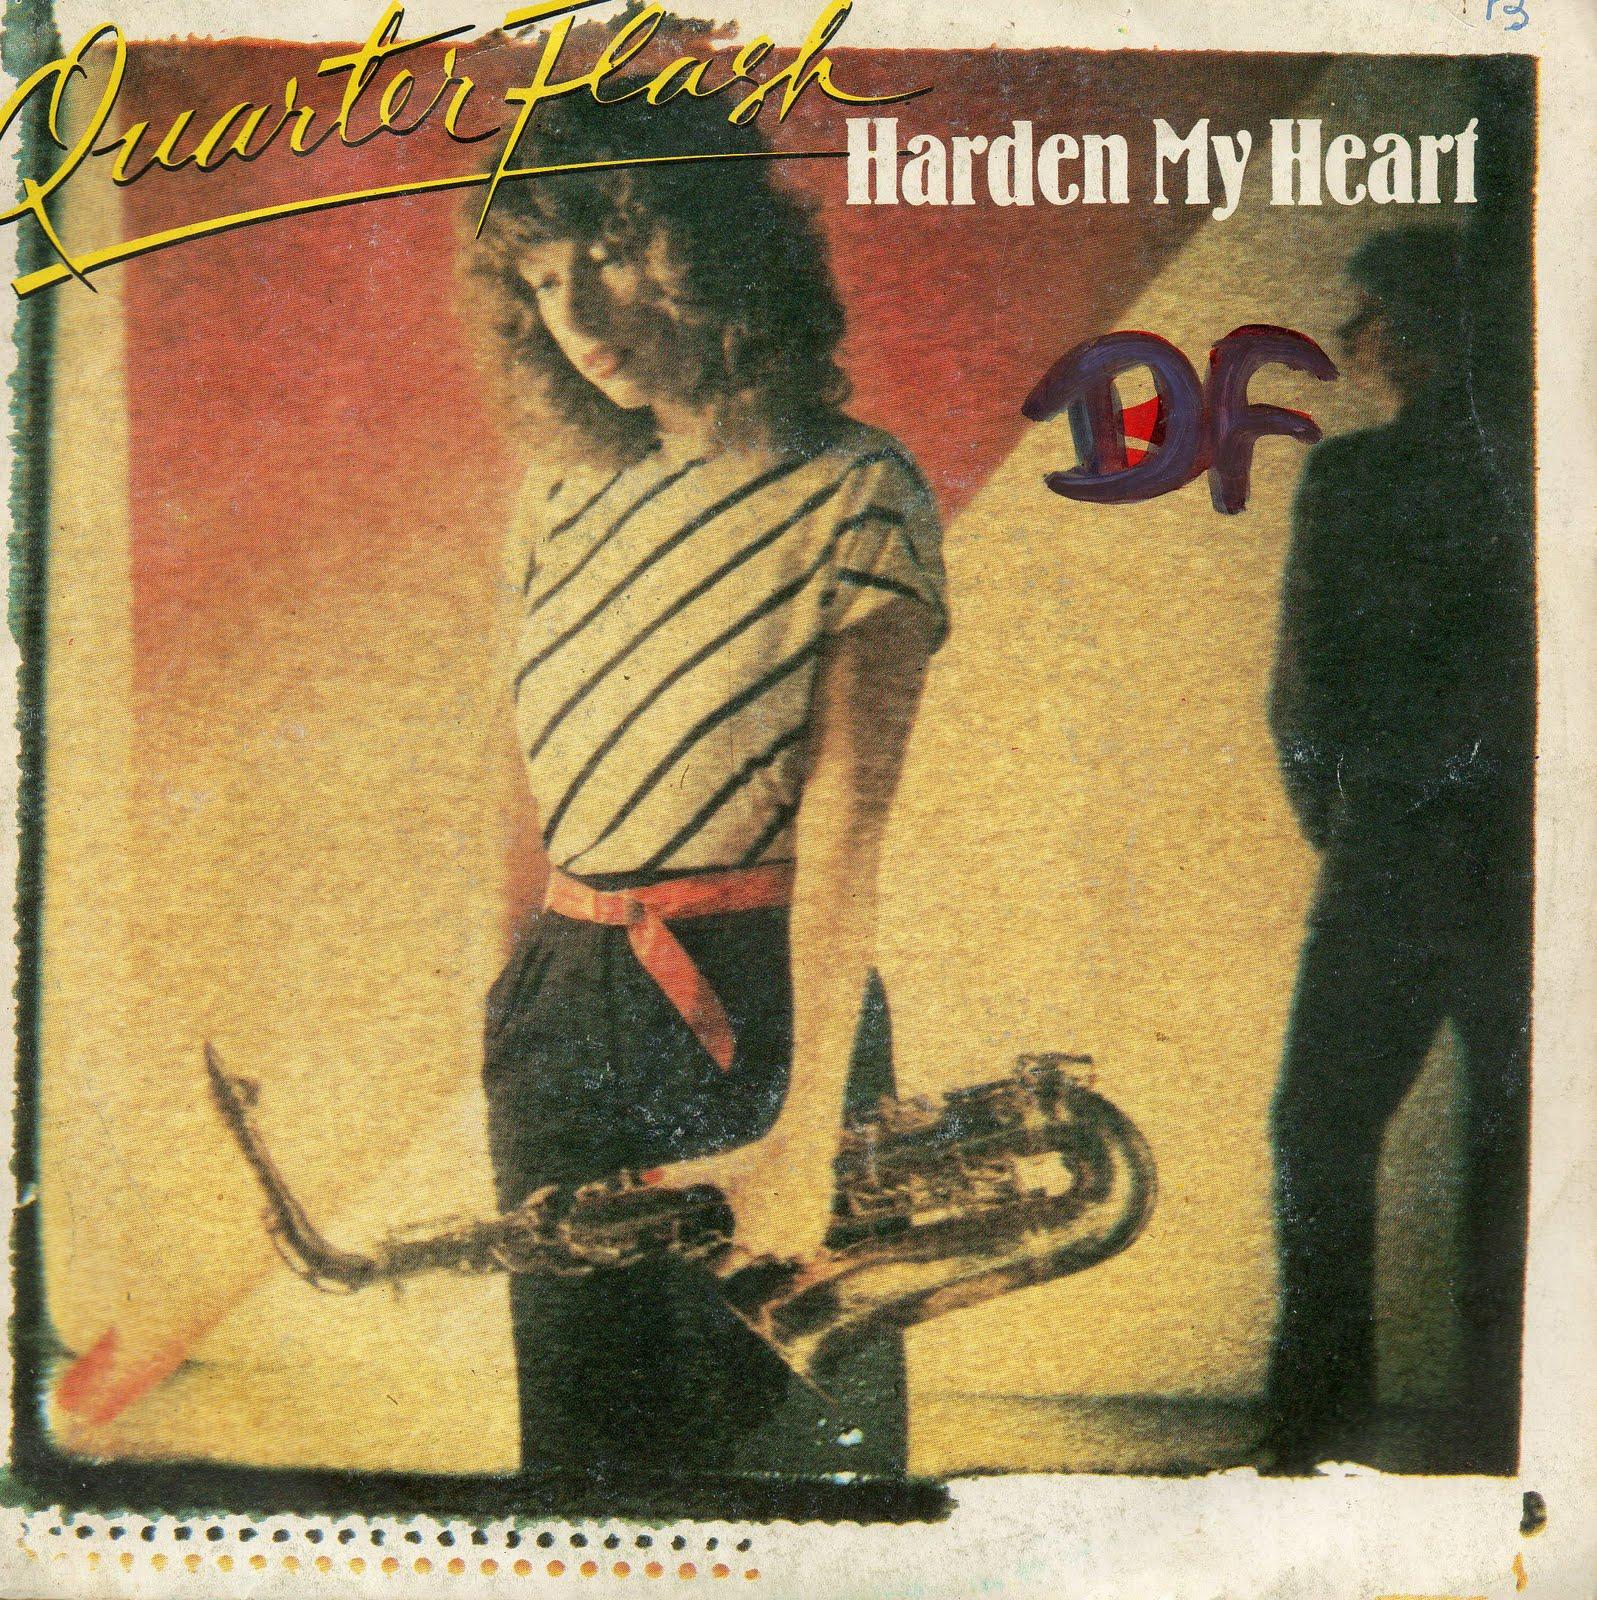 quaterflash harden my heart copertina 45 giri